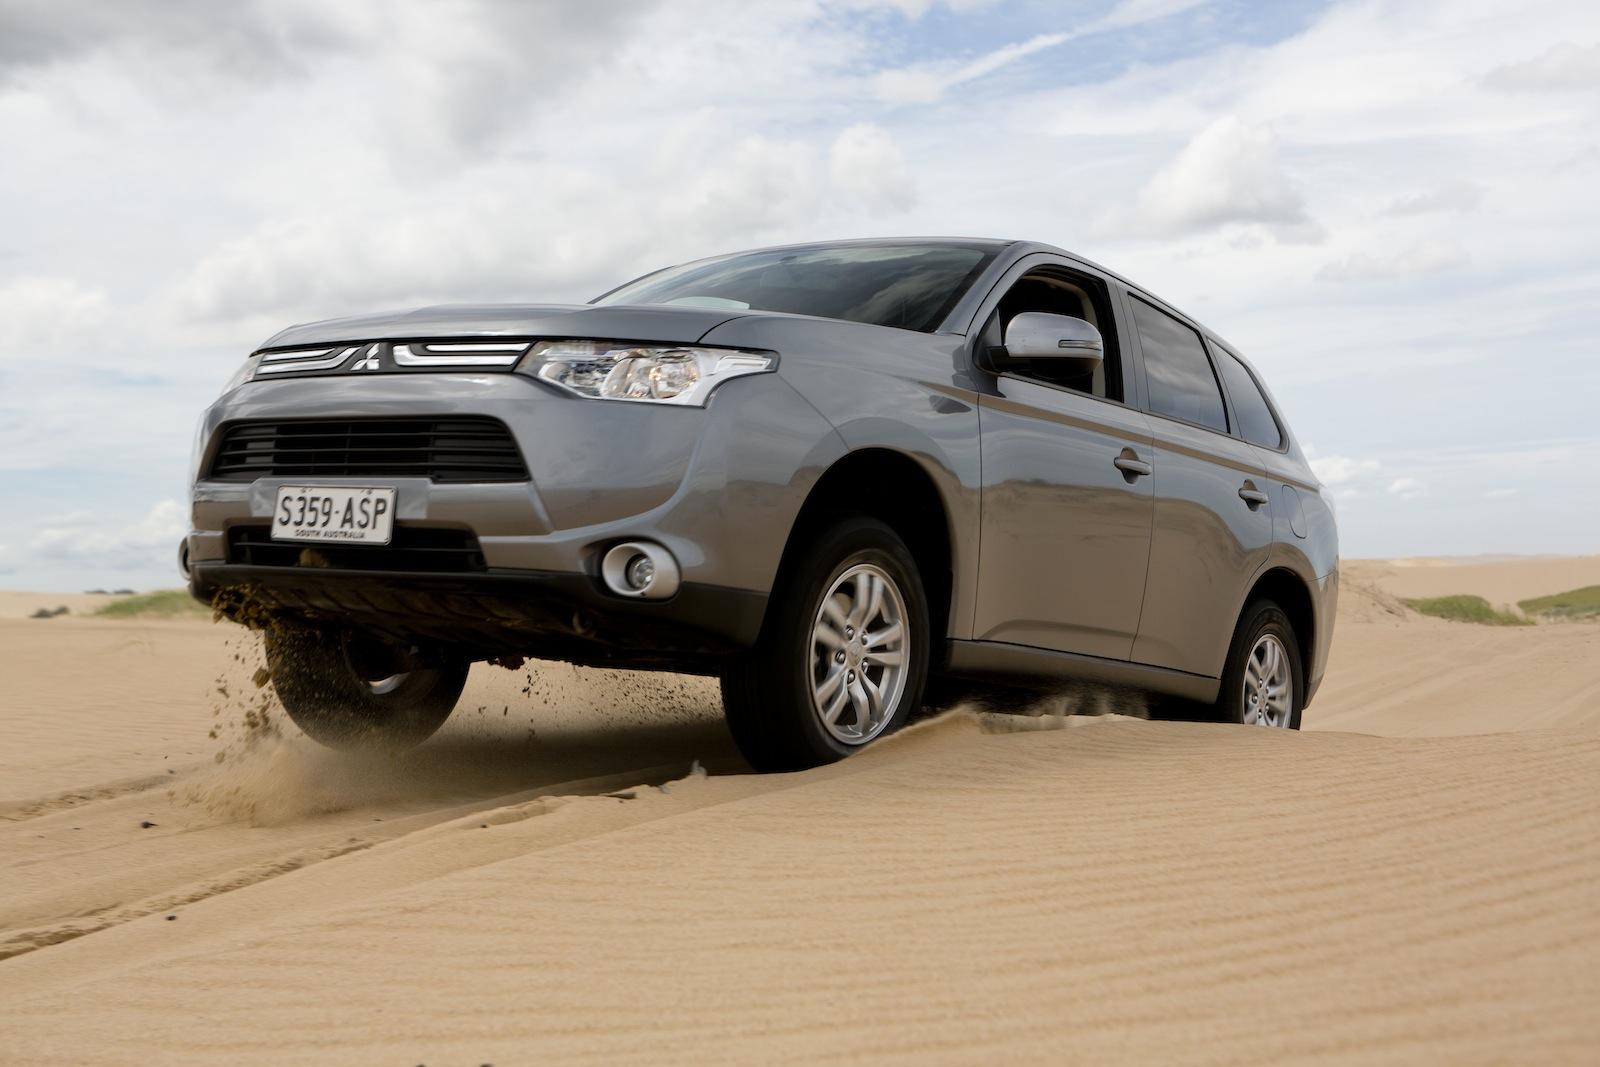 Compact suv comparison mazda cx 5 v toyota rav4 v subaru for Honda compact suv